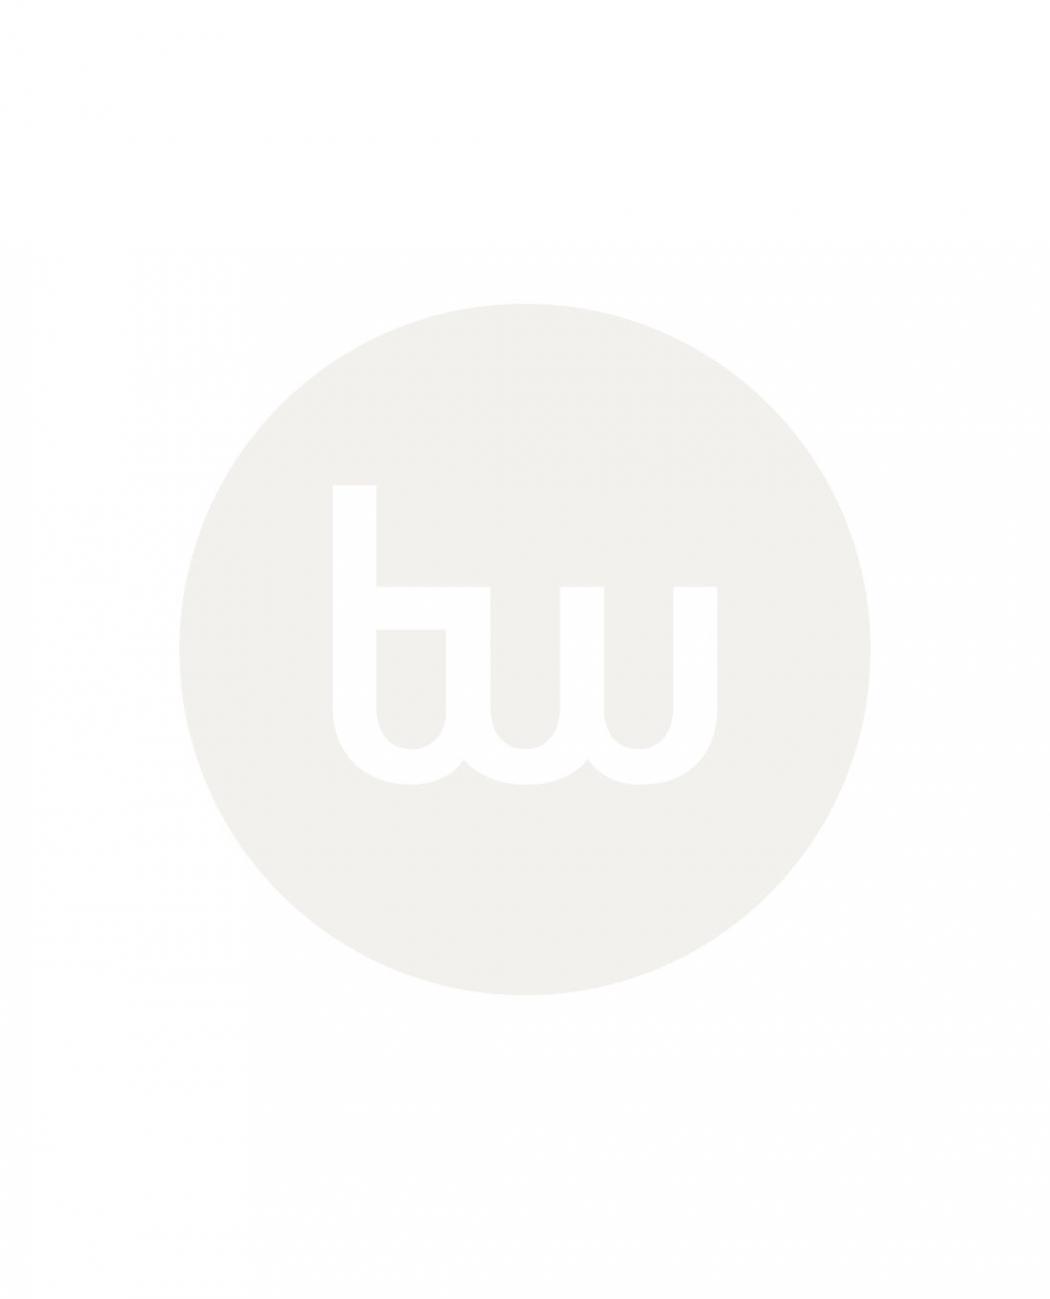 f0685731f61b6 Café Viereck Unicorn Army Patch - TACWRK